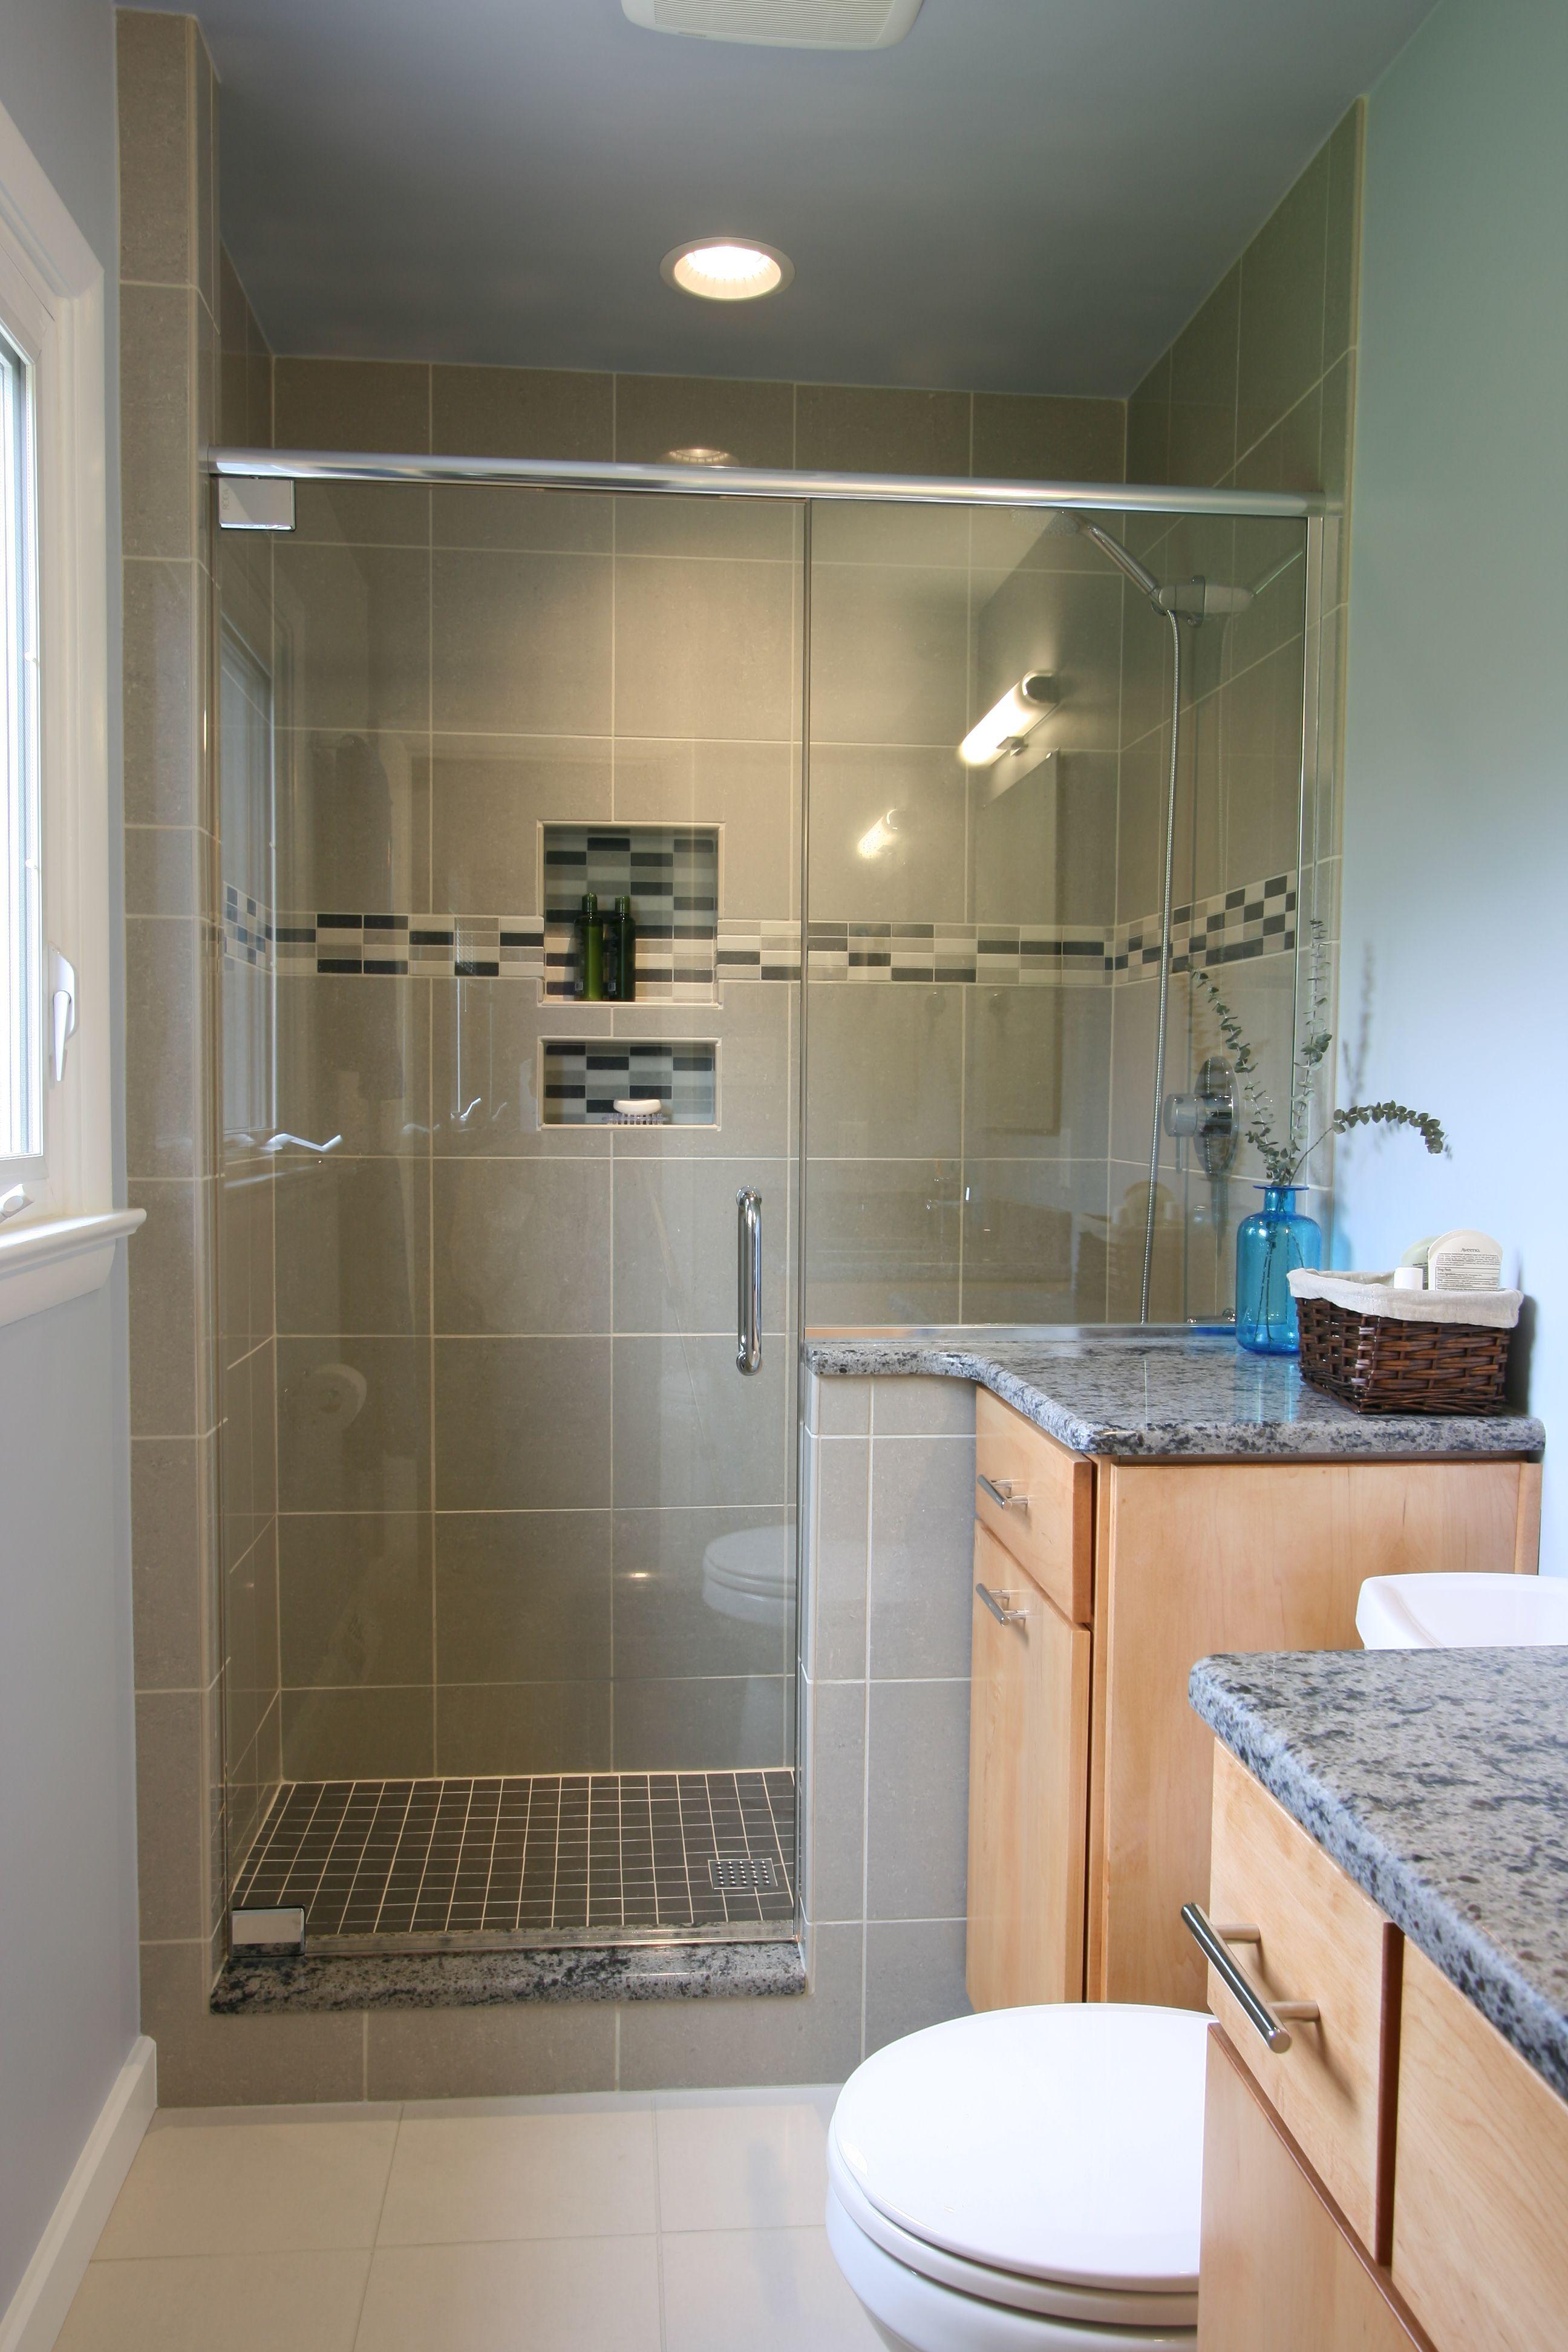 plete new bath Custom tile shower with recessed niche